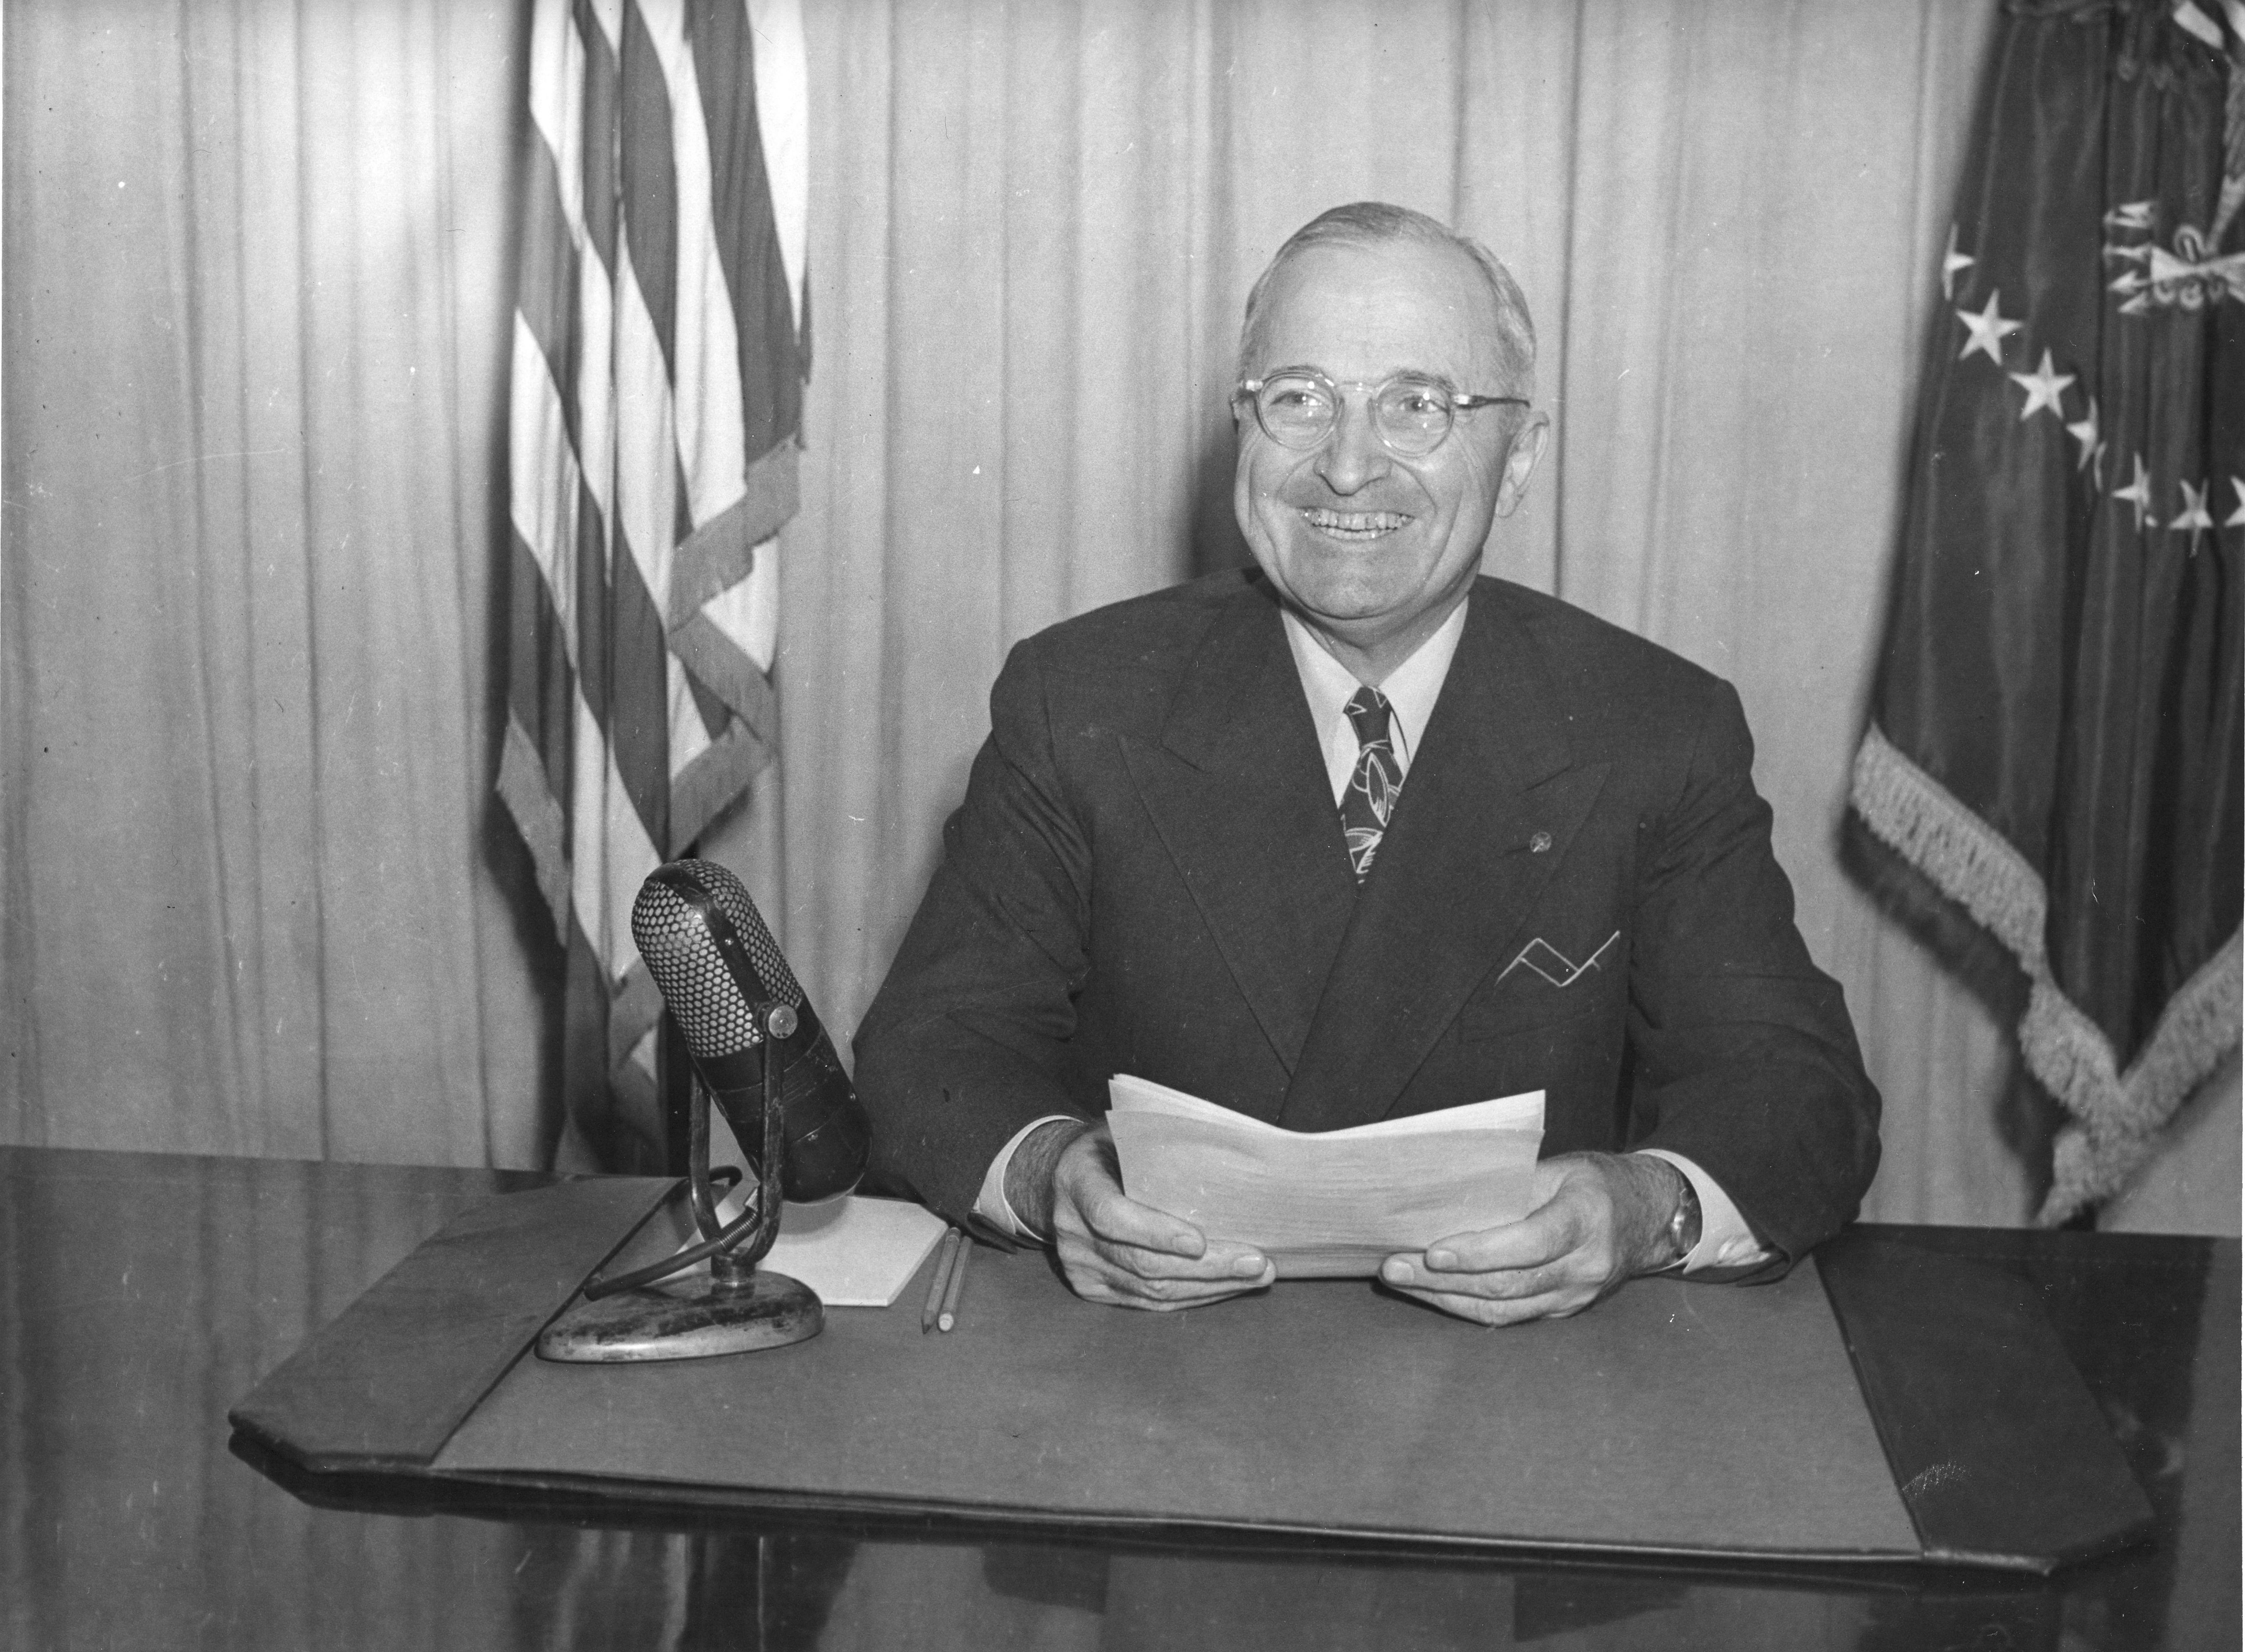 President Harry Truman's radio address